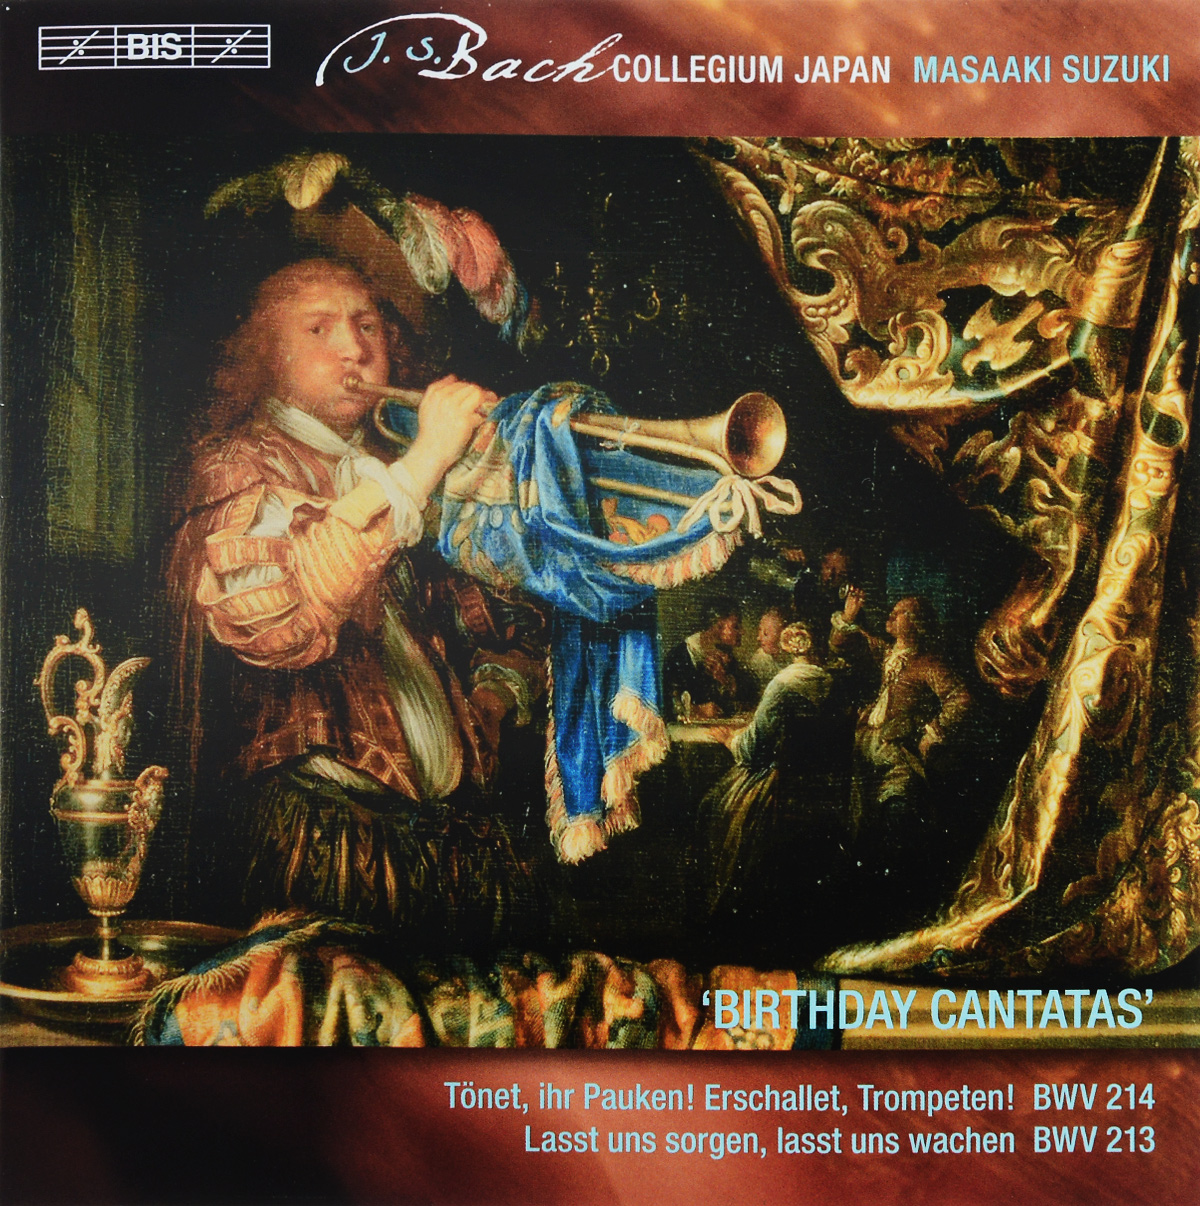 Bach Collegium Japan Chorus & Orchestra,Масааки Сузуки,Joanne Lunn,Робин Блазе,Доминик Вернер,Макото Сакурада Bach Collegium Japan, Masaaki Suzuki. Bach. Secular Cantatas. Vol. 5 (SACD)